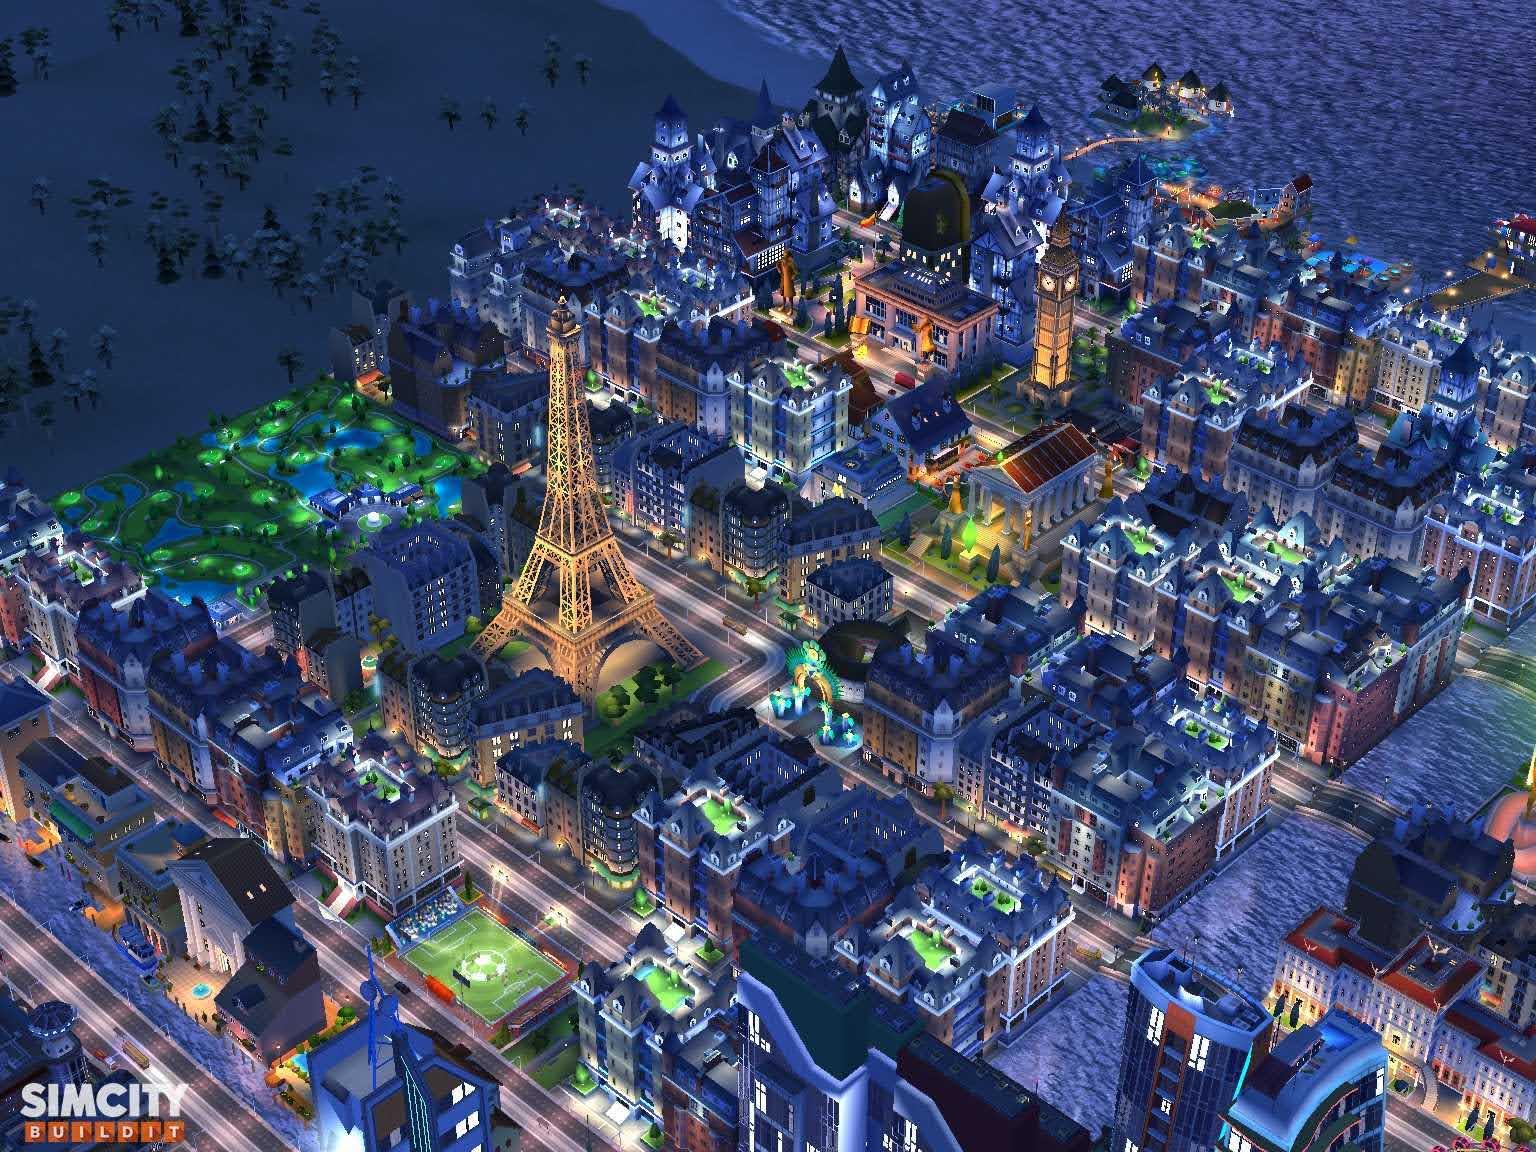 Birds eye view of the Eiffel Tower